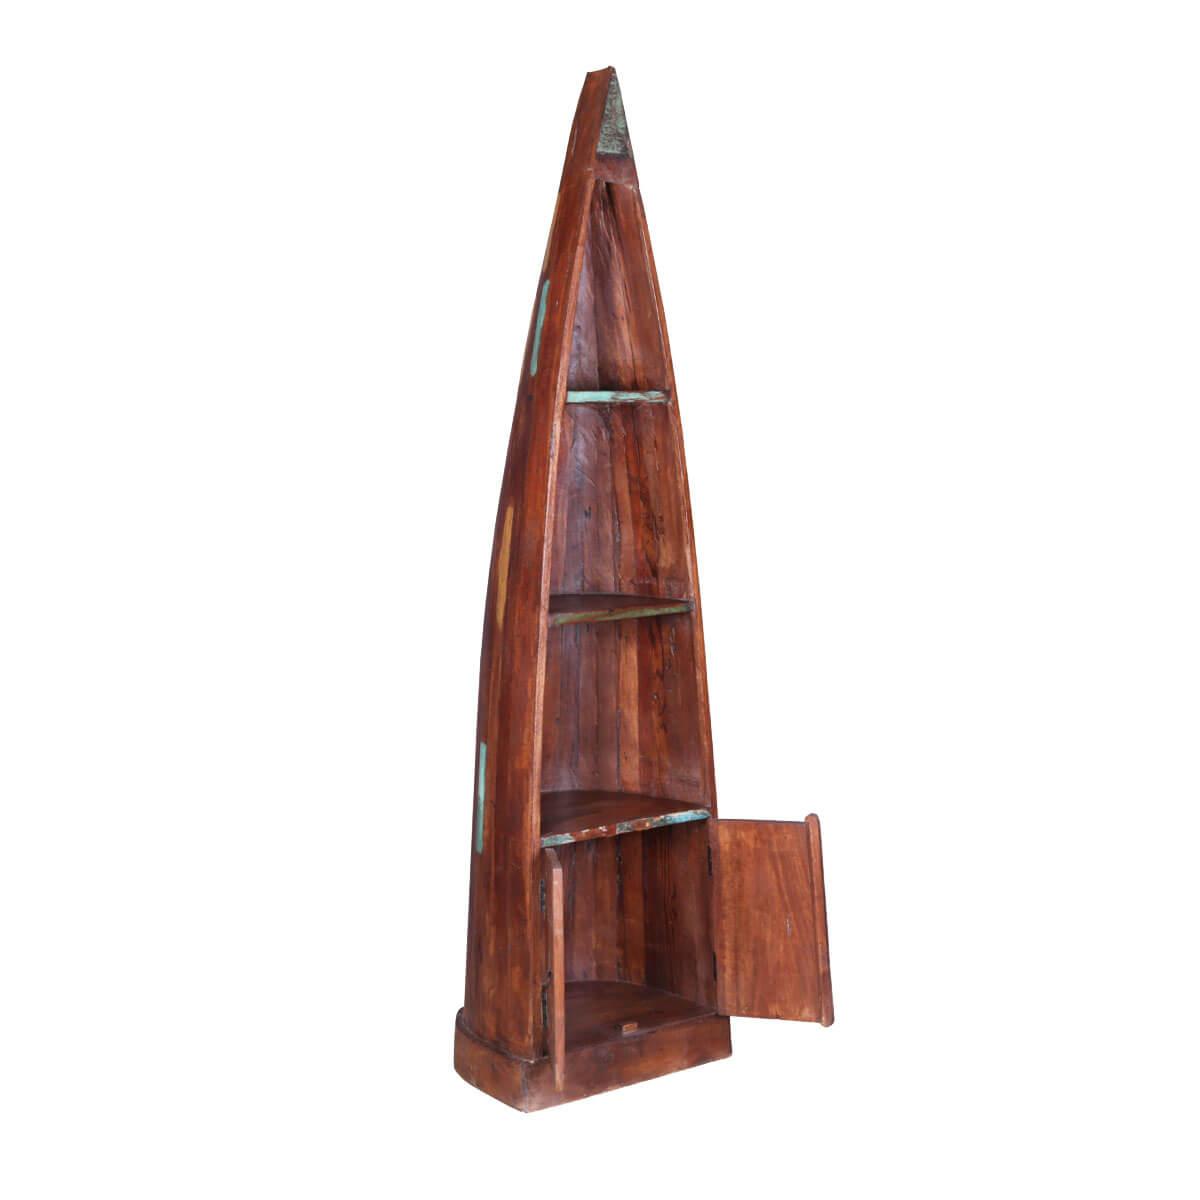 Weirton 3 Open Shelf Reclaimed Wood Canoe Bookcase With Door Cabinet